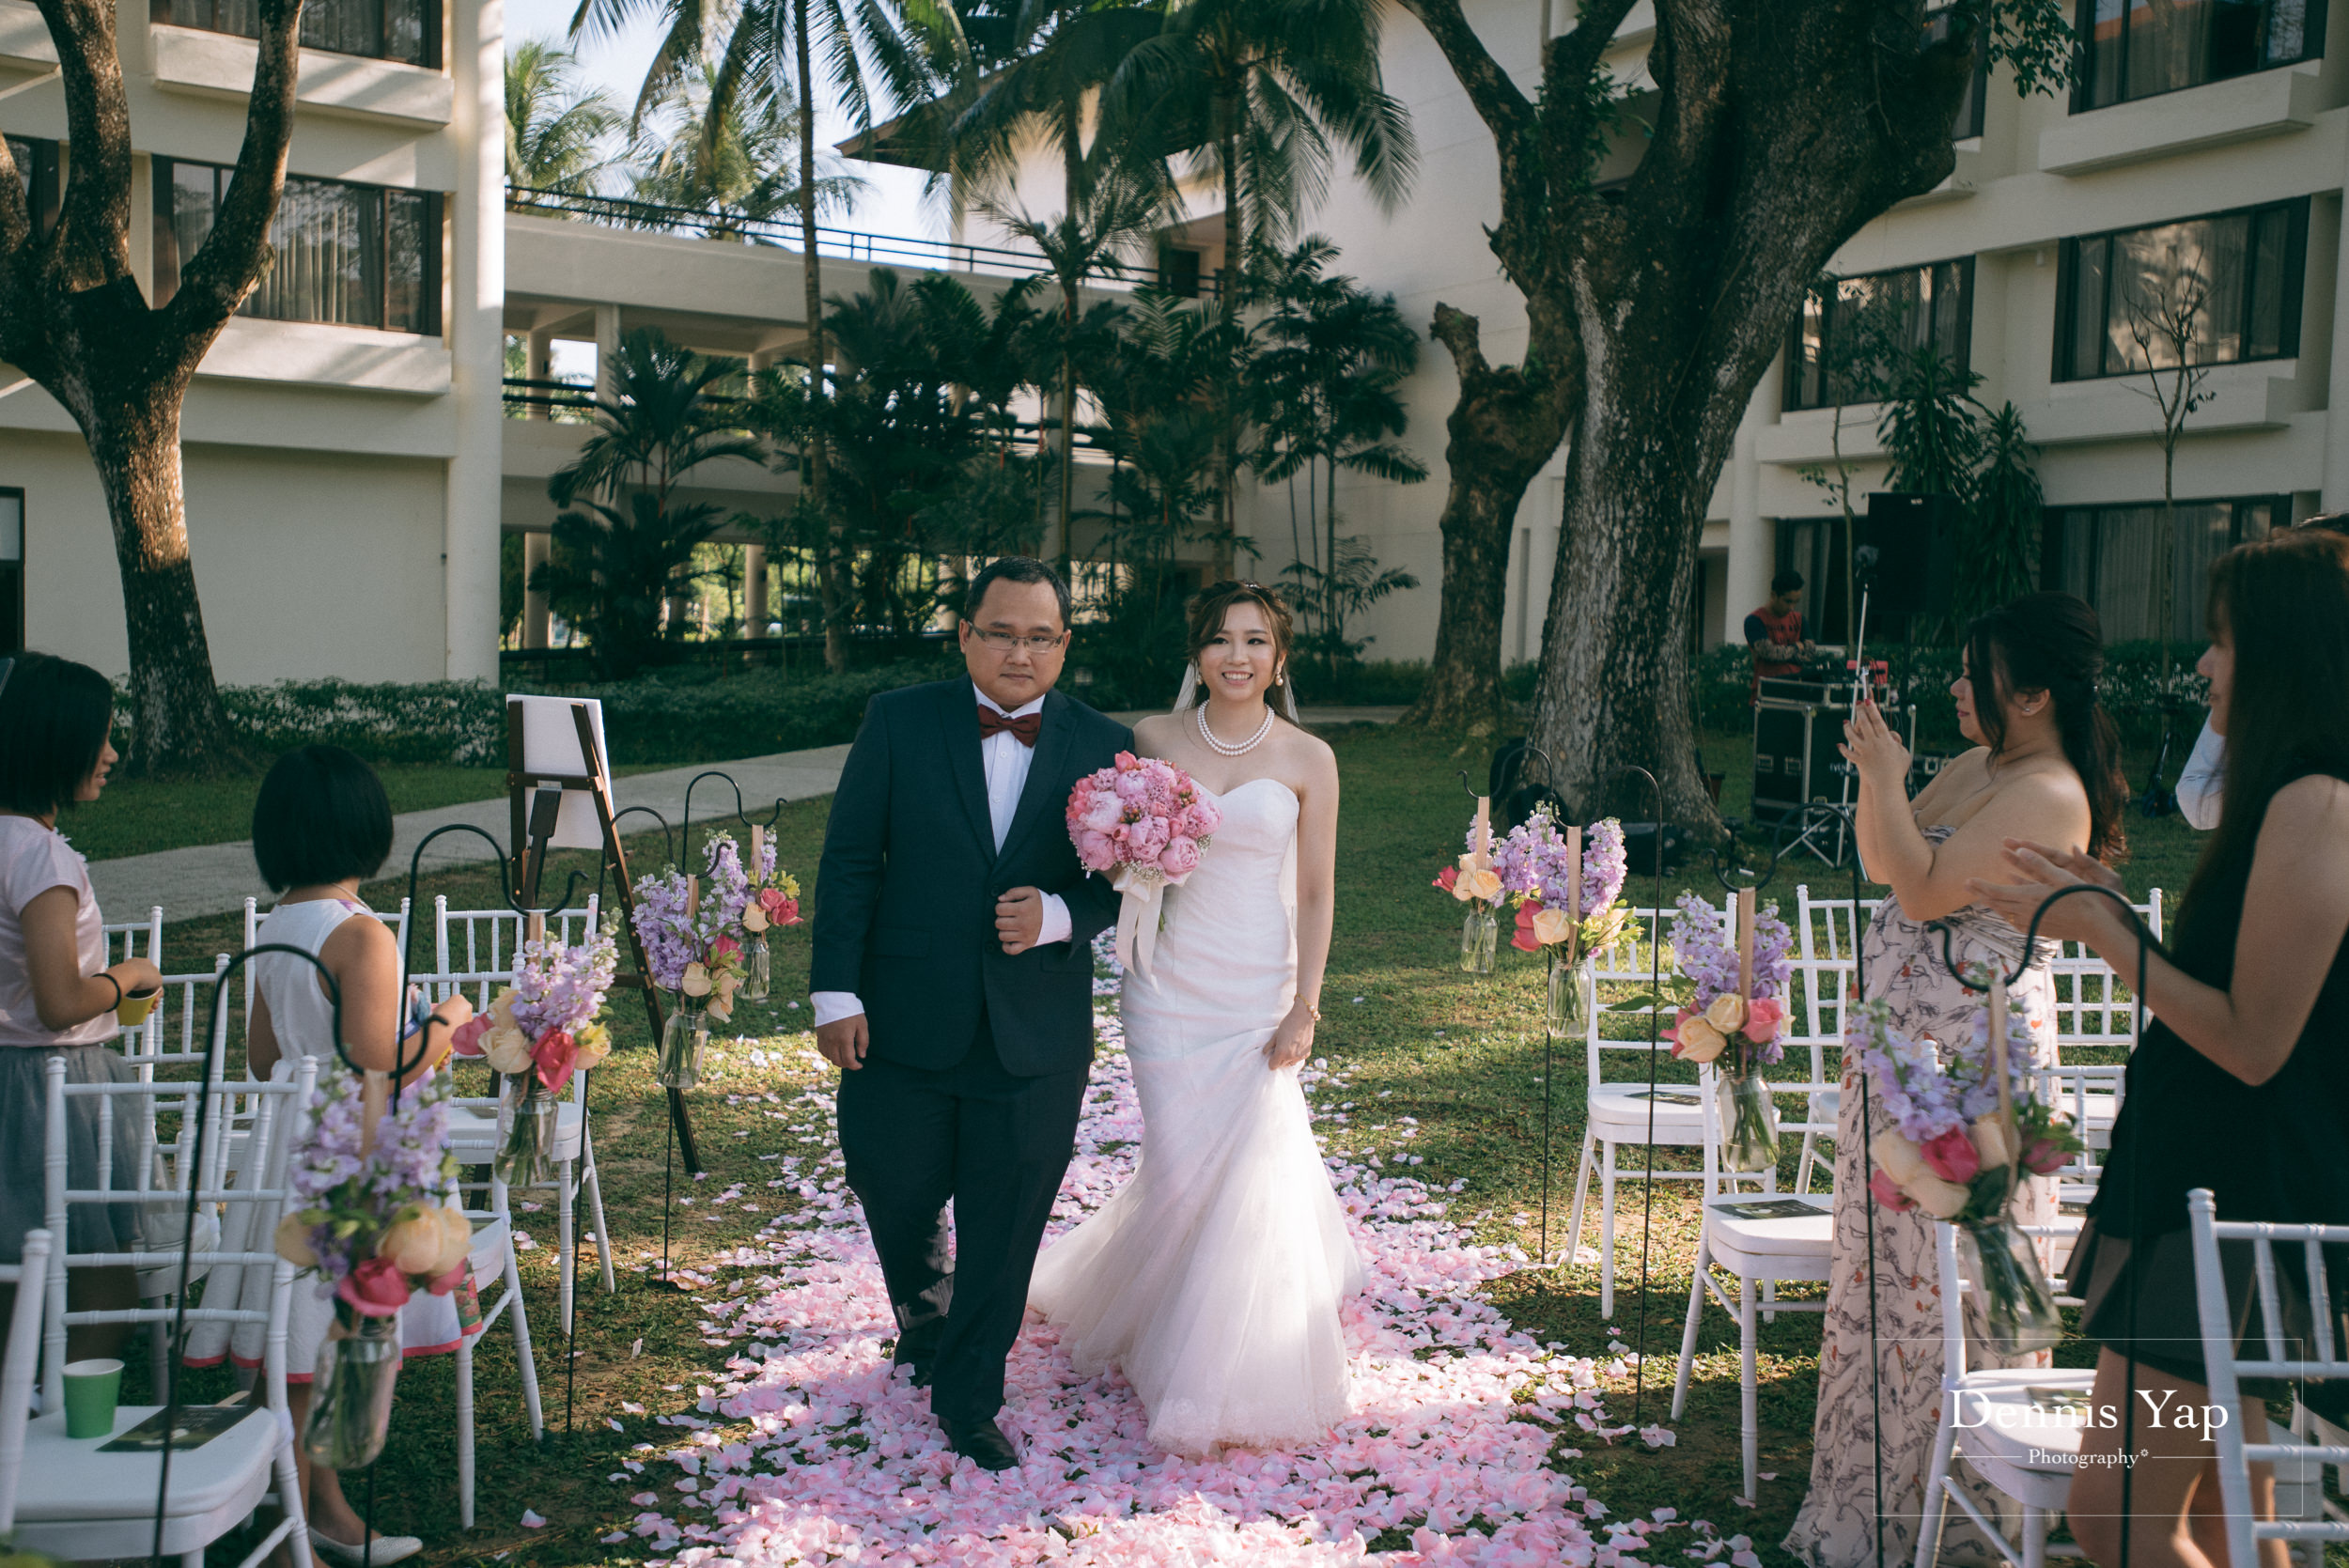 taylai cheng yee garden wedding saujana hotel subang jaya dennis yap photography sunlight-13.jpg